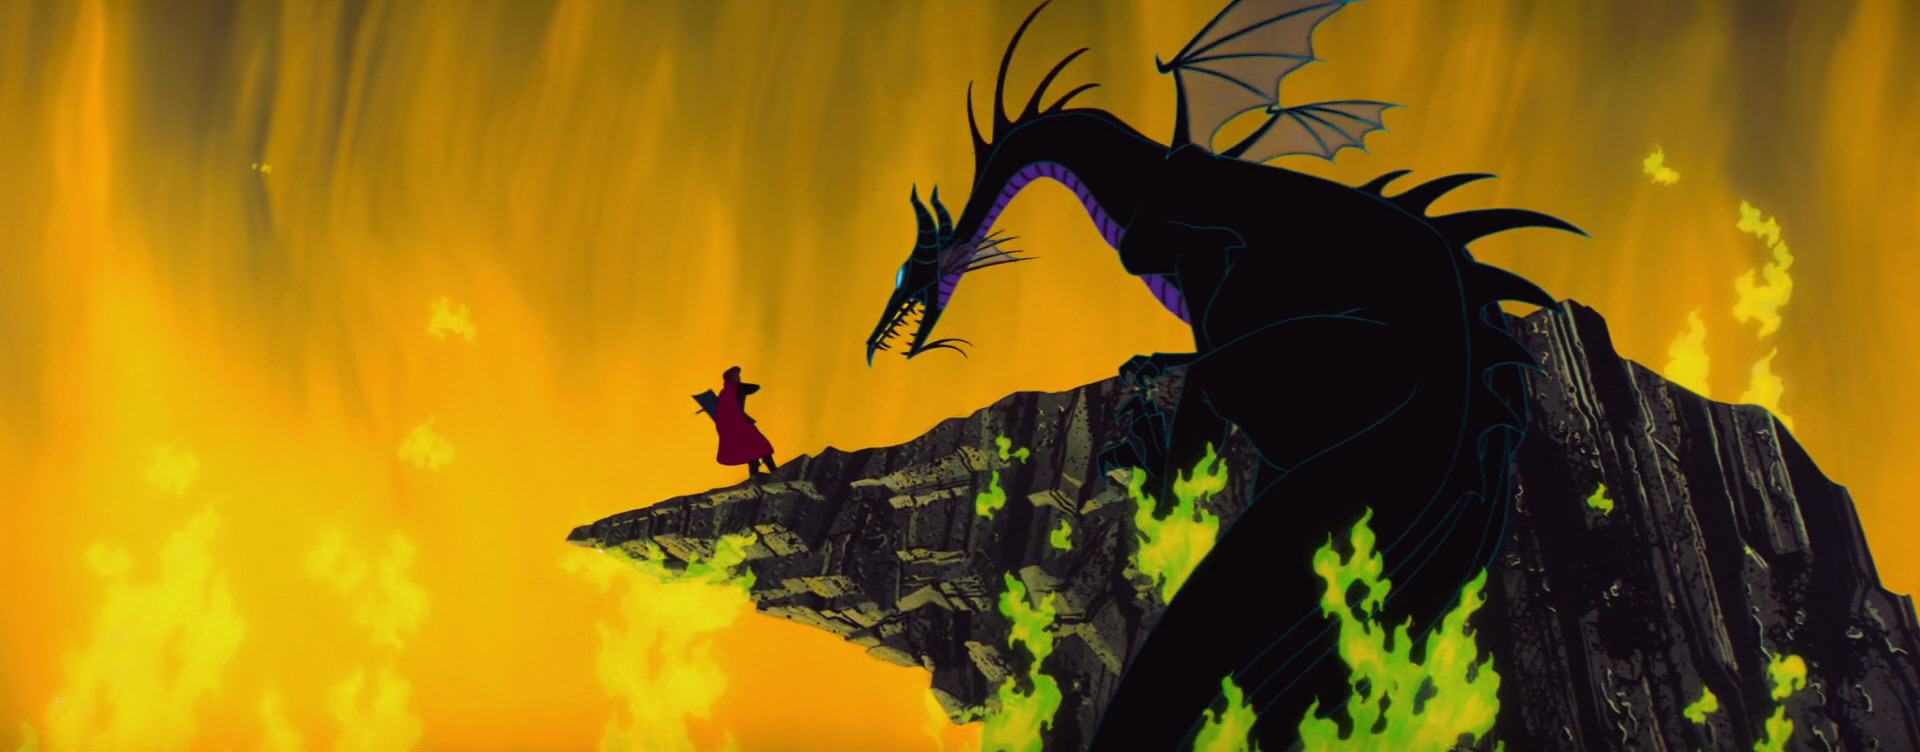 Sleeping Beauty Maleficent Dragon